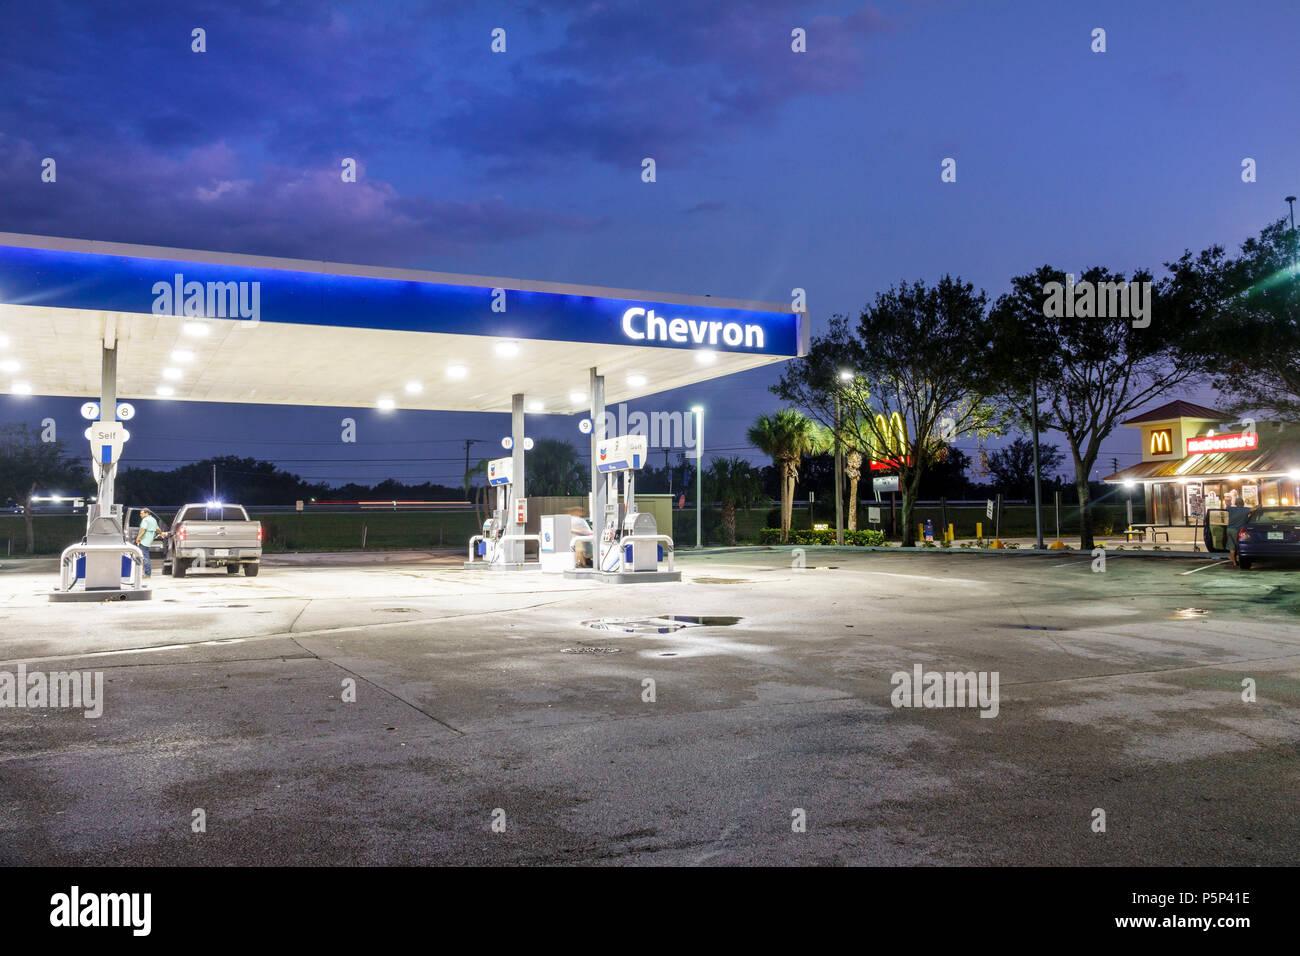 Stuart Florida night Chevron gas petrol filling fueling station pumps canopy - Stock Image